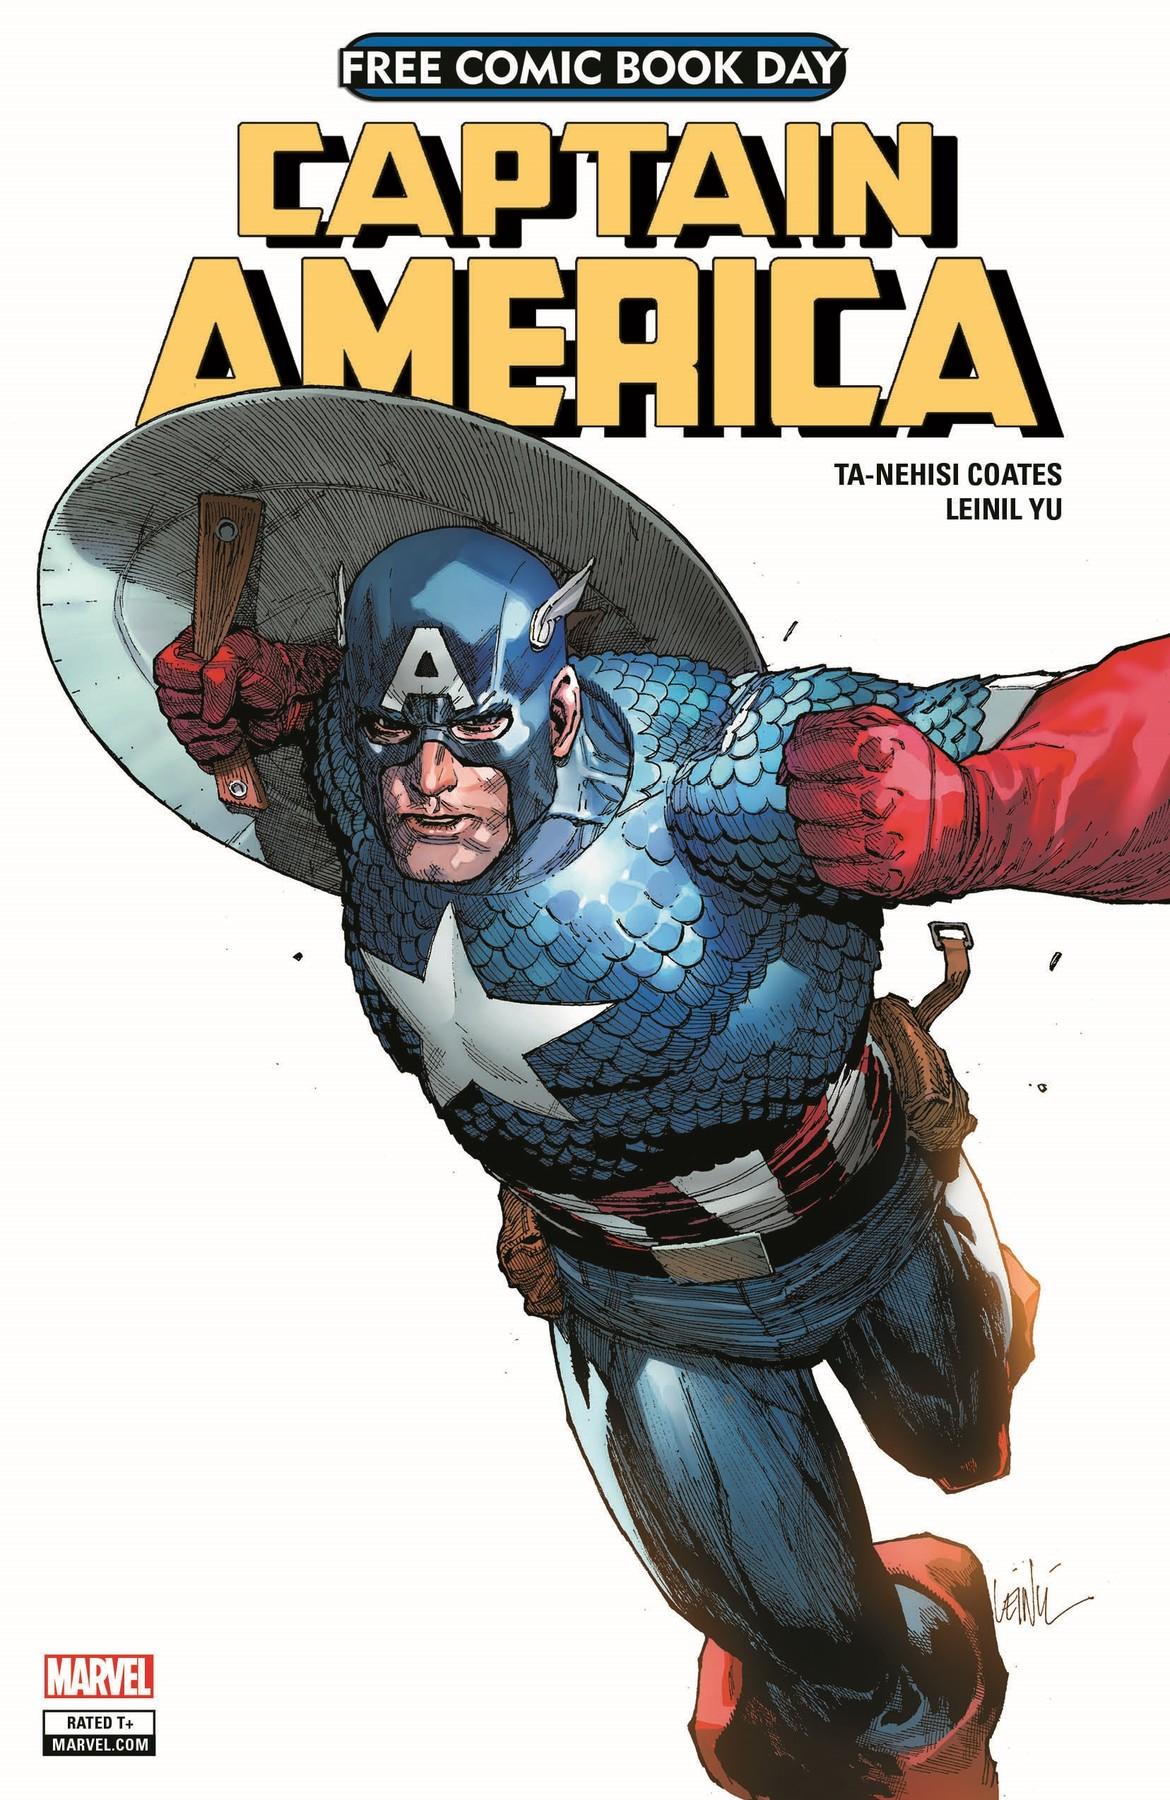 ta-nehisi_coates_and_leinil_yu_avengers_captain_america_free_comic_book_day_issue.jpg